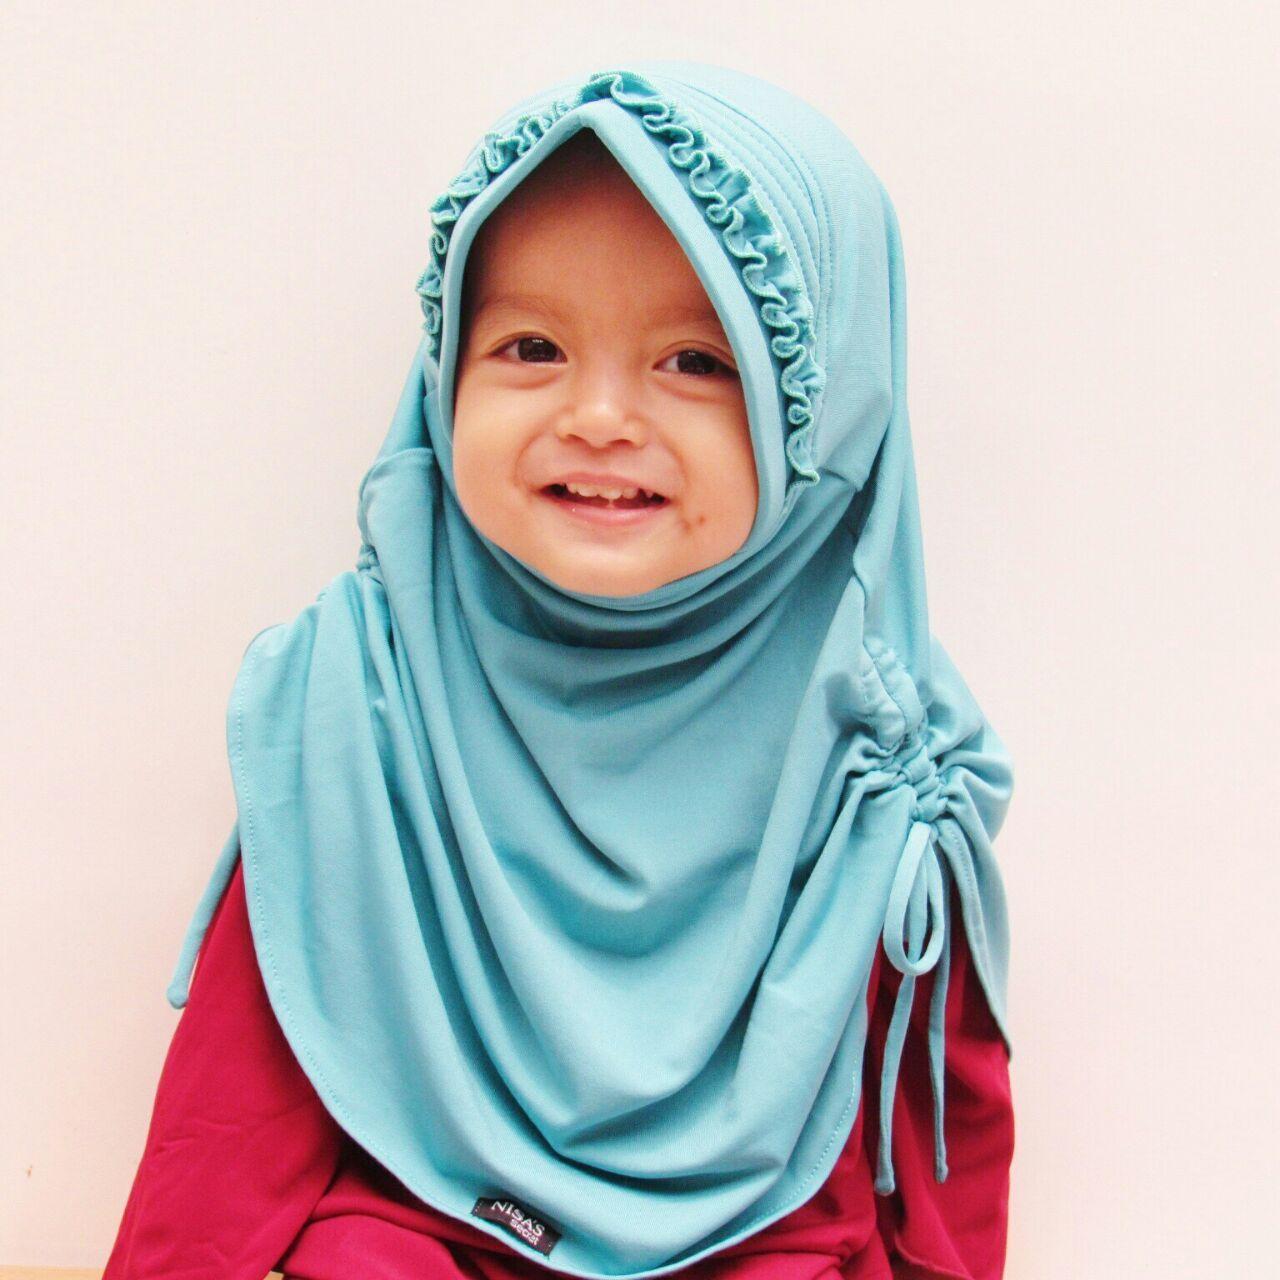 0812 2405 1465 Pusat Jilbab Anak Pusat Jilbab Anak Kecil Pusat Jilbab Anak Murah Pusat Jilbab Anak Bayi Pusat Jilbab Anak Model Pakaian Bayi Anak Model Pakaian